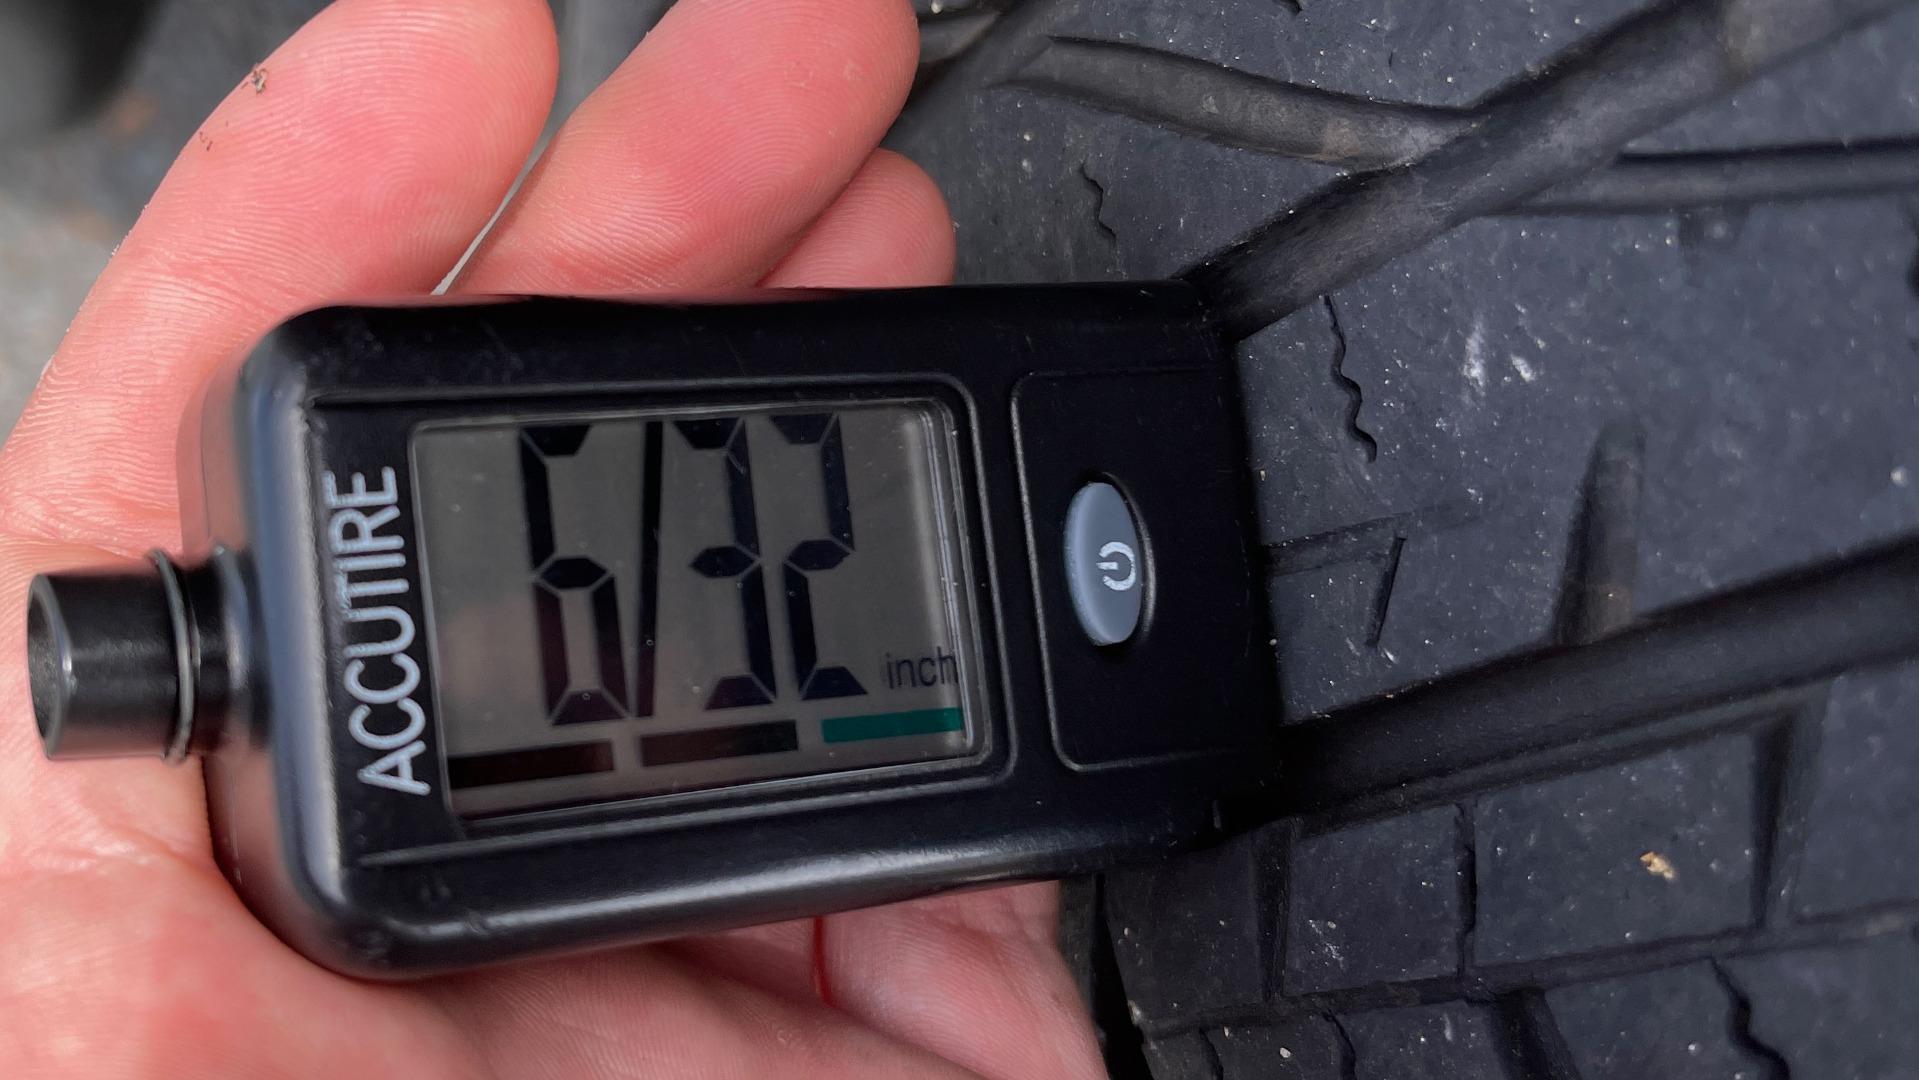 Used 2014 Mitsubishi OUTLANDER SPORT ES 2WD / 2.0L / CVT TRANS / 18IN WHEELS / 31MPG for sale $8,495 at Formula Imports in Charlotte NC 28227 62